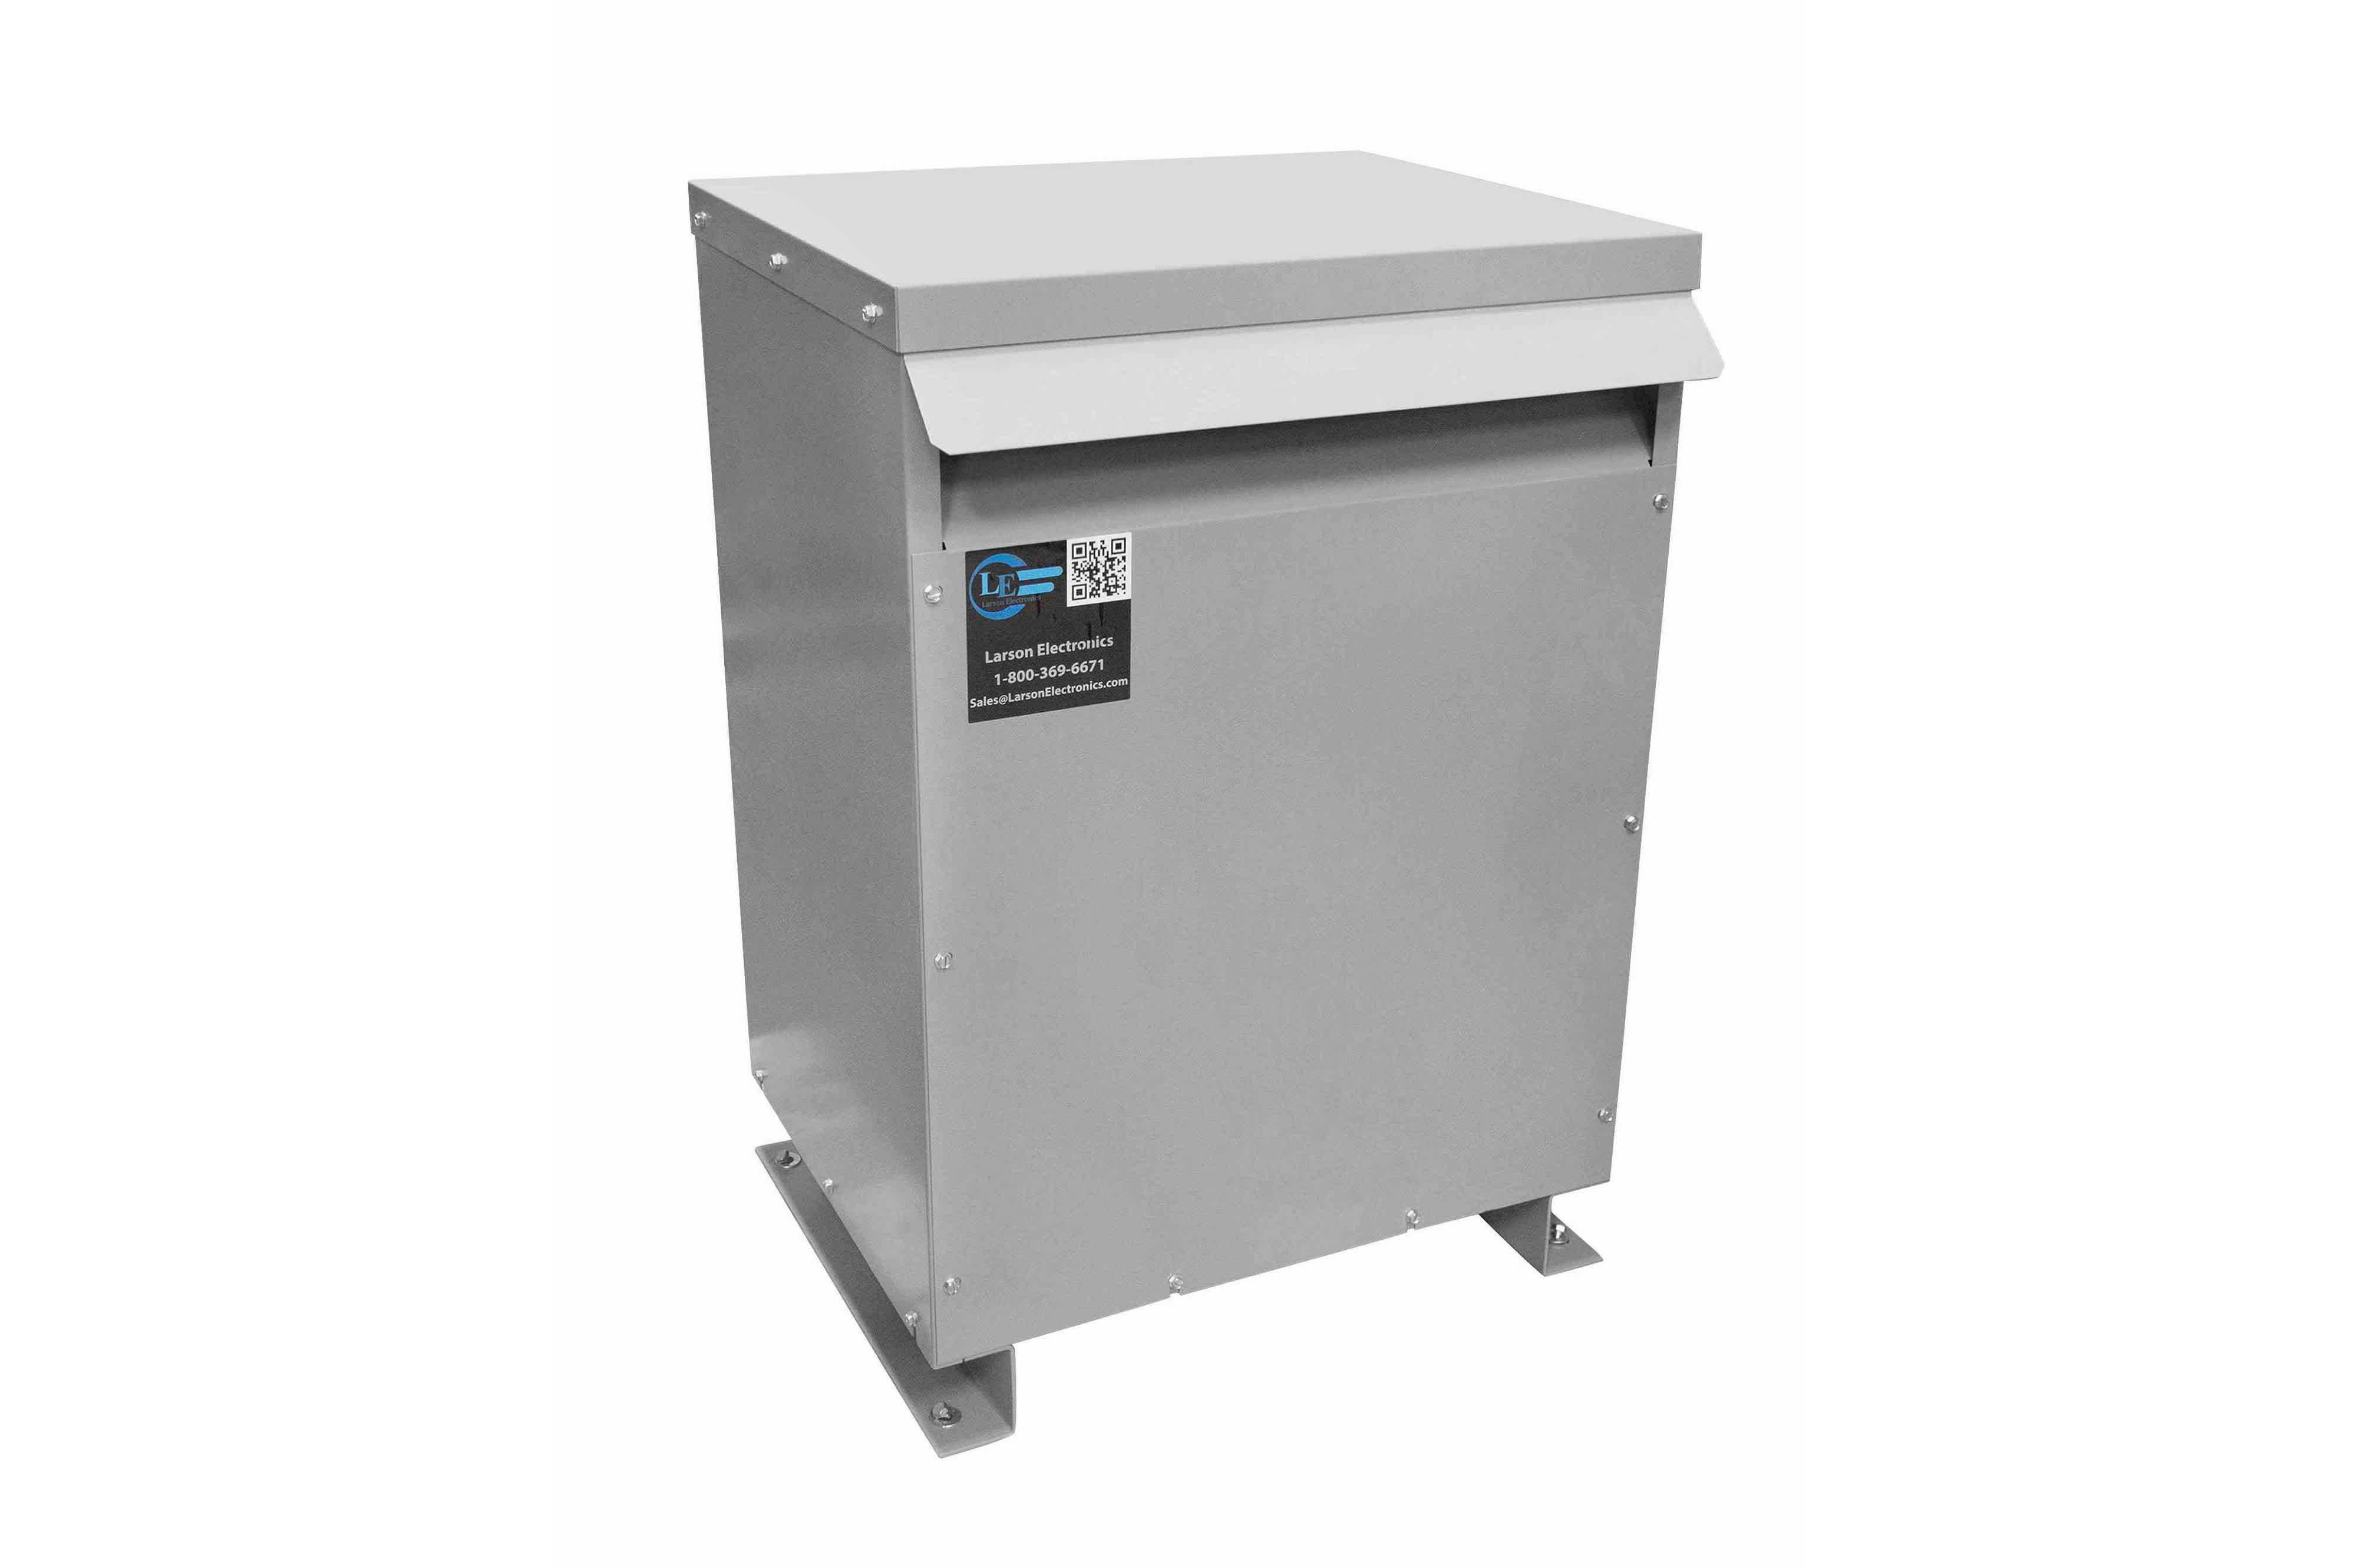 80 kVA 3PH Isolation Transformer, 440V Wye Primary, 240V Delta Secondary, N3R, Ventilated, 60 Hz